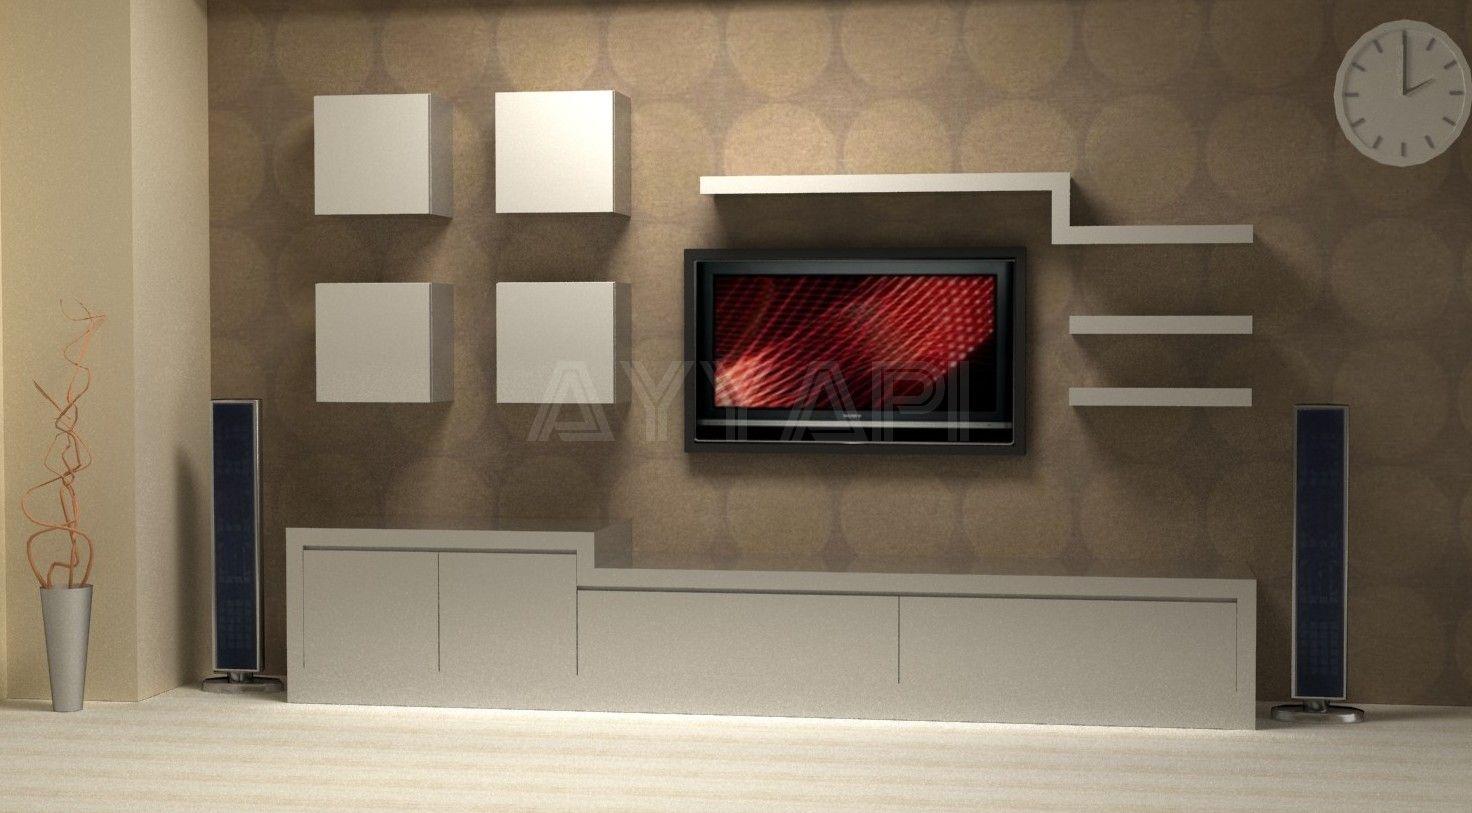 Tv Wall Panel Led Unit Design Shelf Corner Shelves Showcase Cabinets Media Center Drawing Rooms